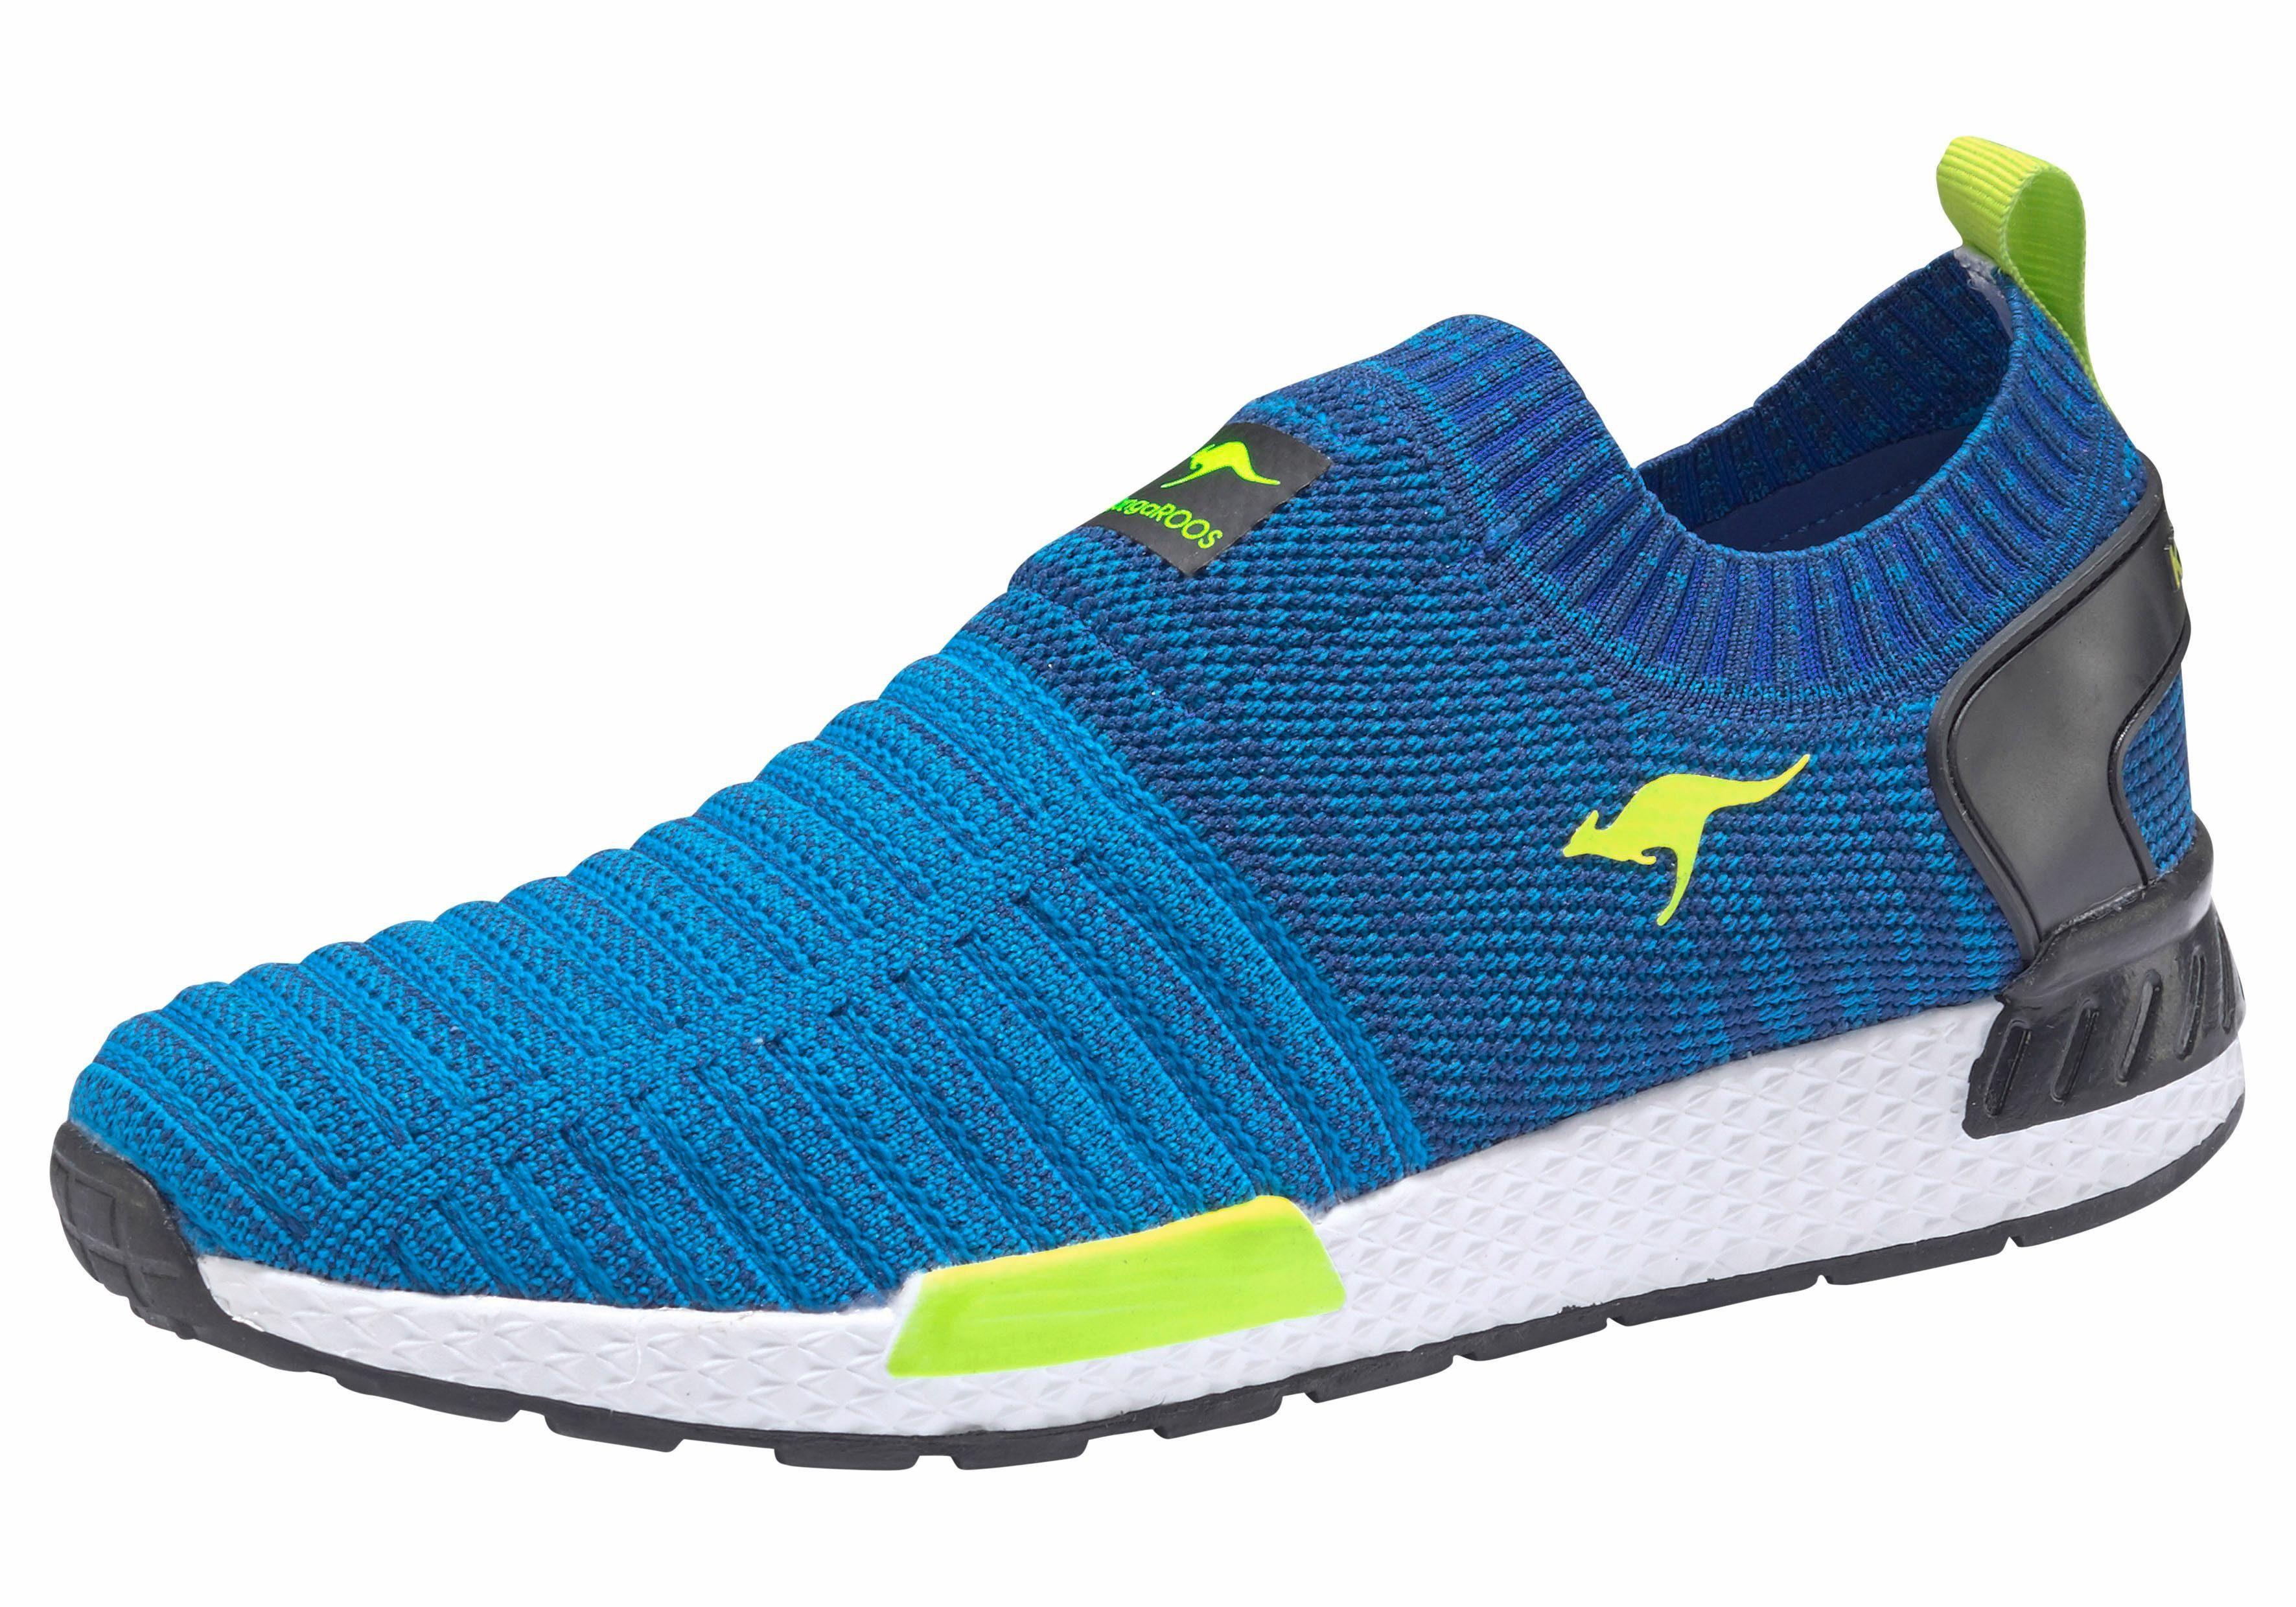 KangaROOS W 600 Sneaker online kaufen  blau-neongrün